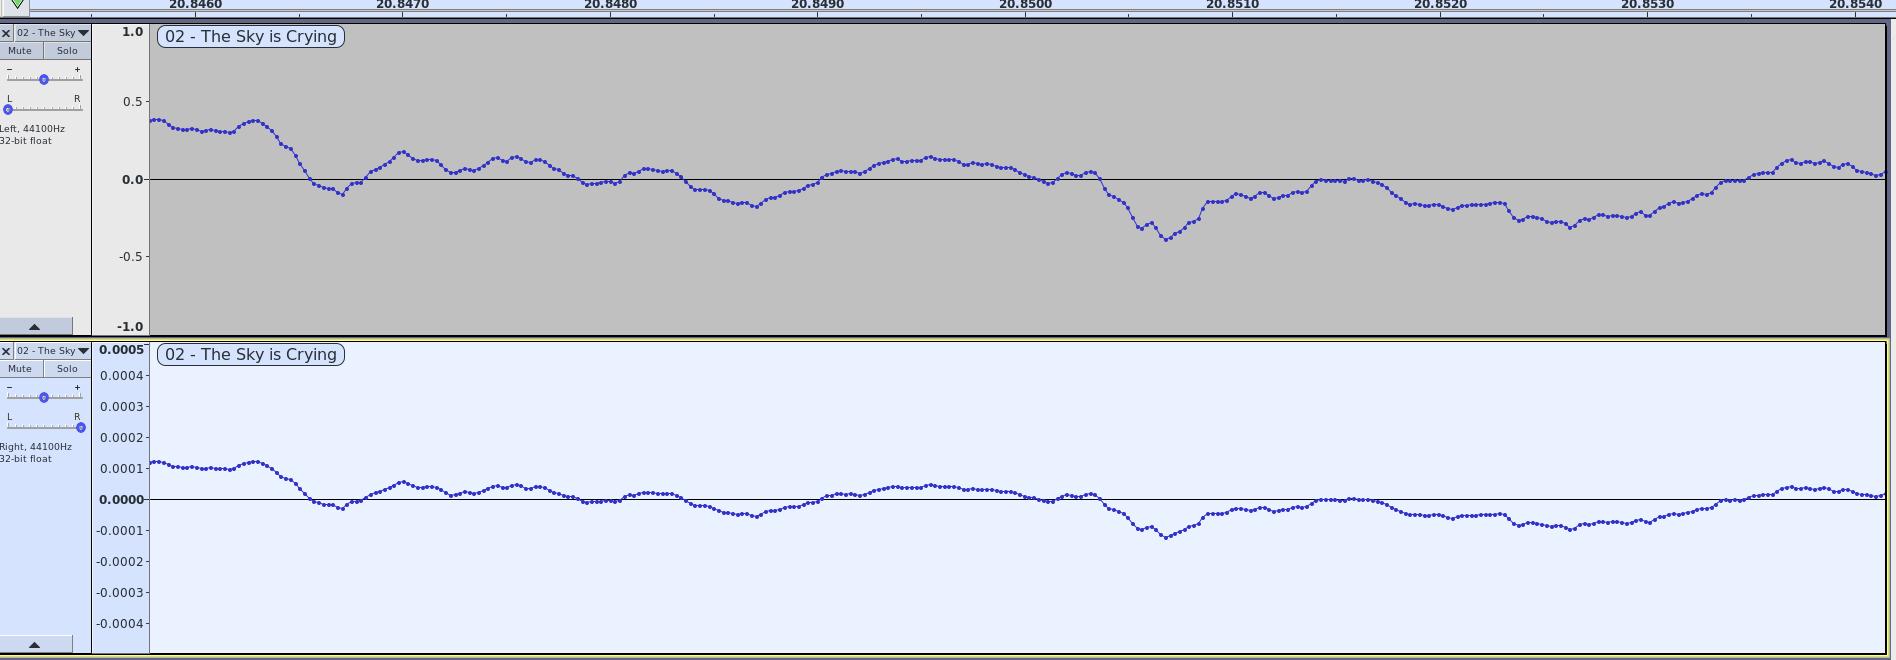 60 db volume drop waveform.png